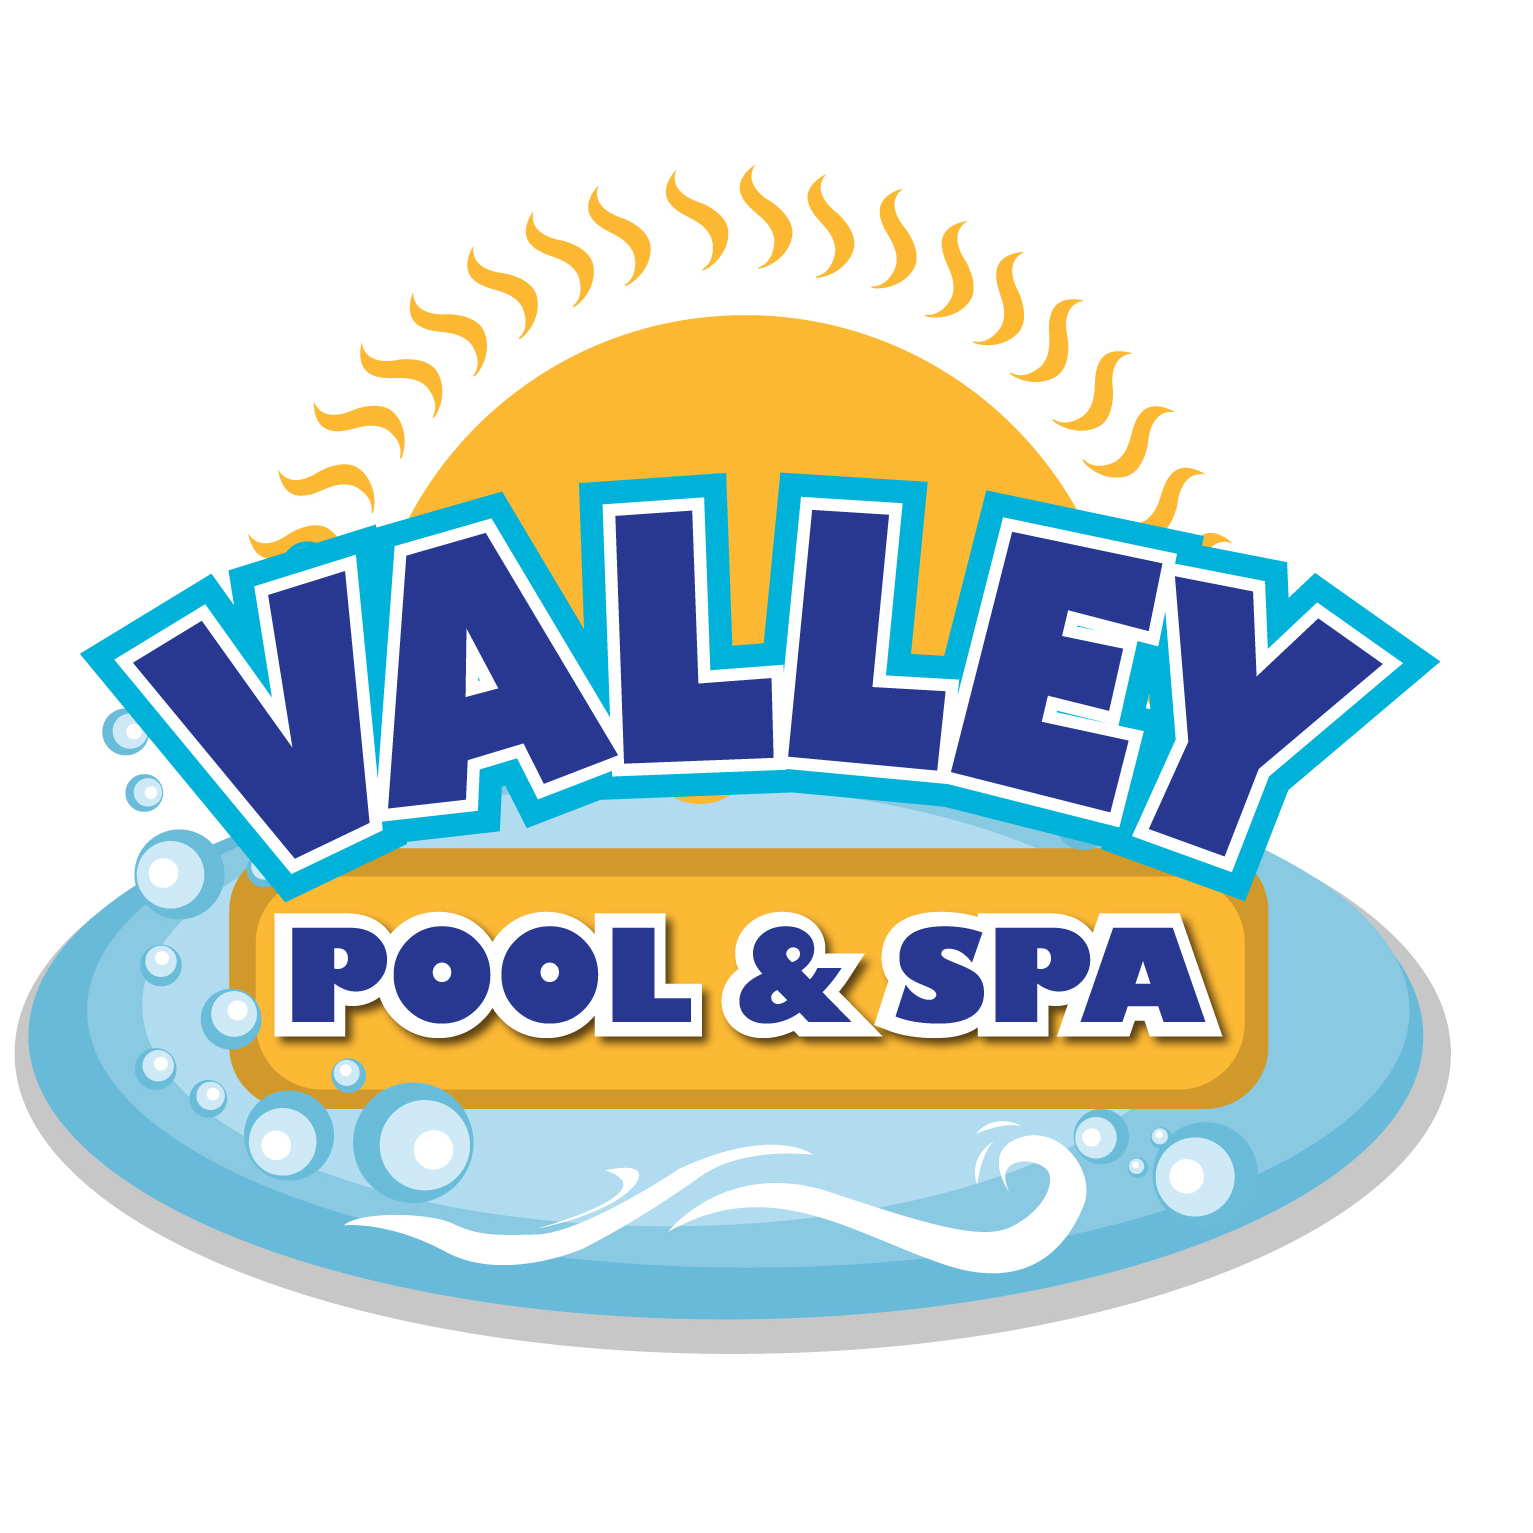 Valley Pool Spa Washington In Washington Pa Swimming Pool Equipment Supplies Yellow